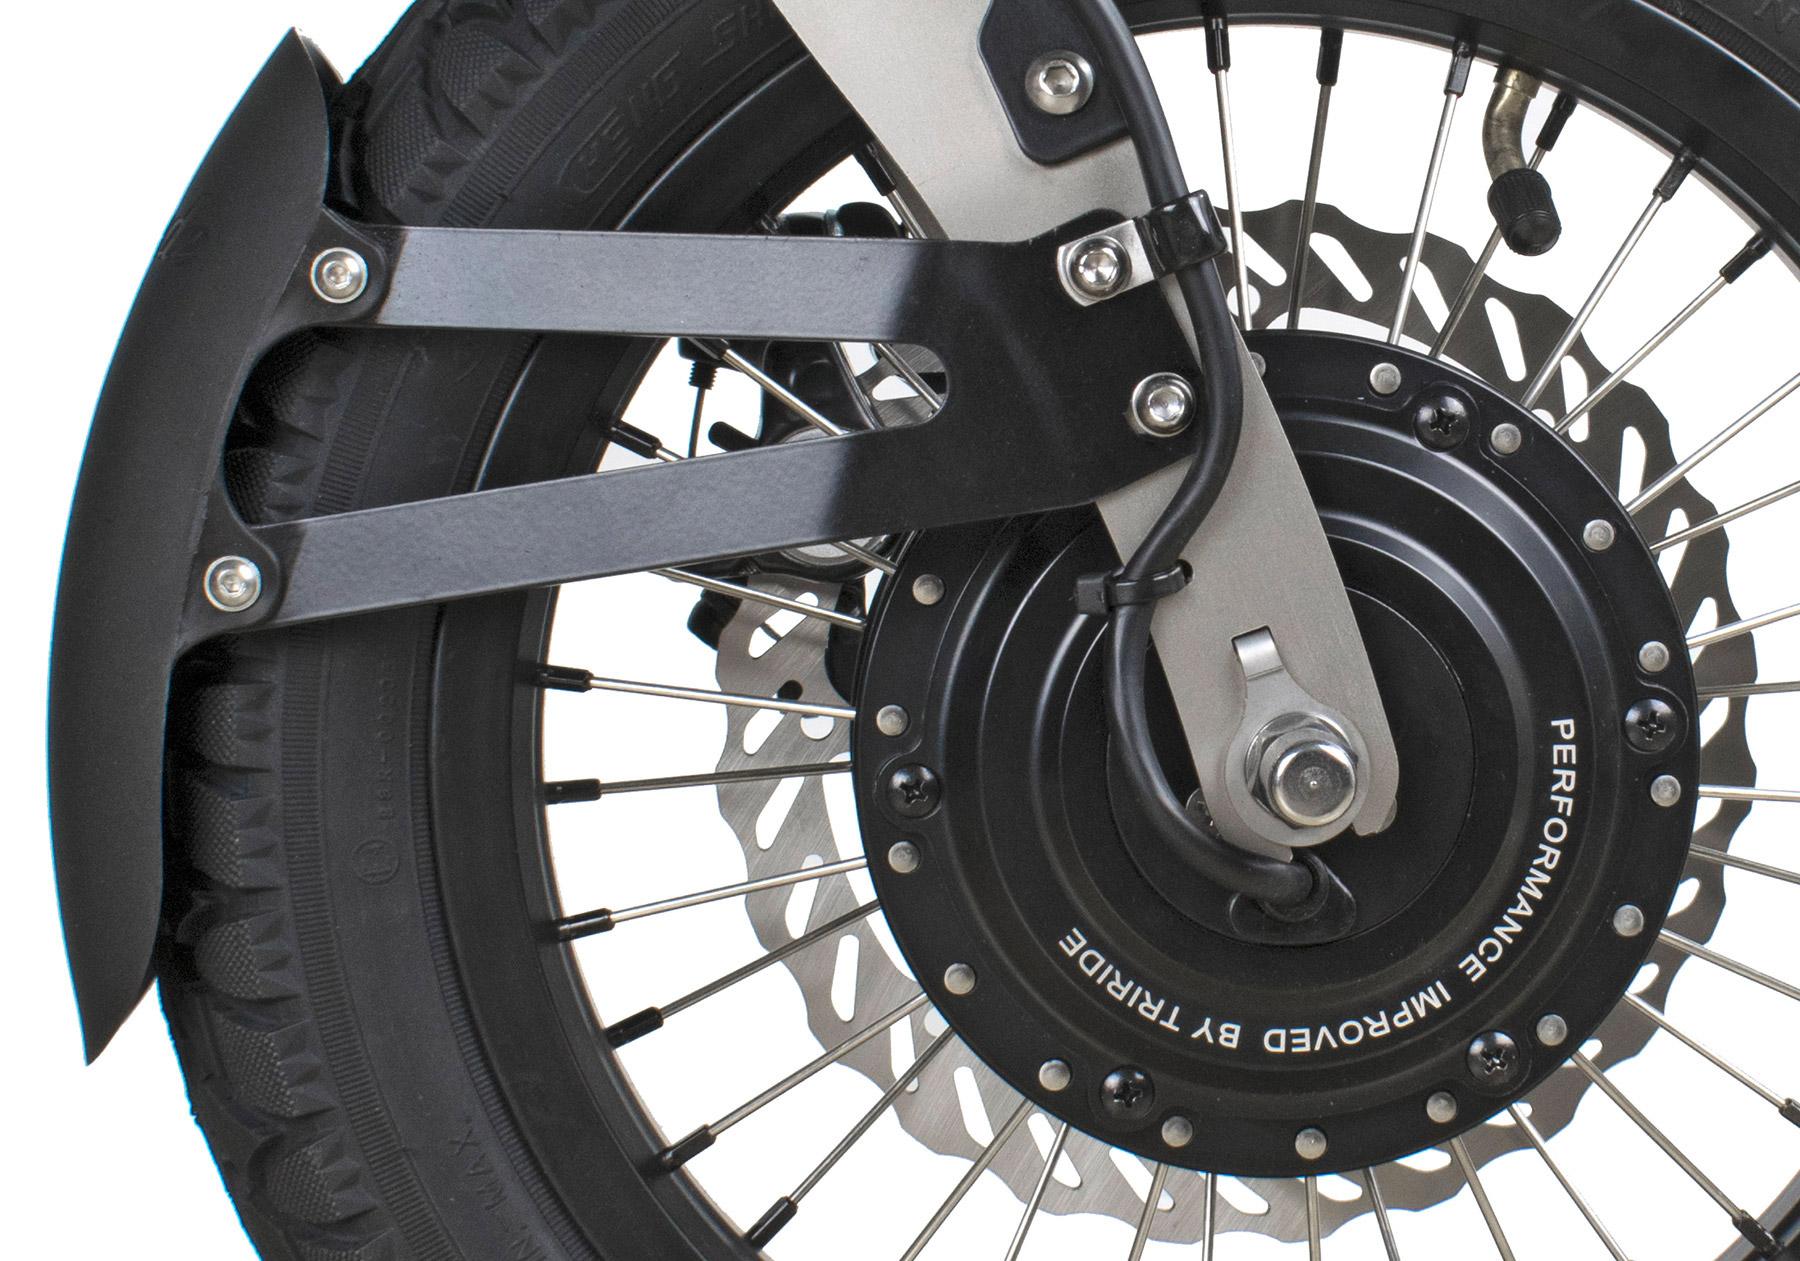 triride-special-light-dettaglio-motore.jpg